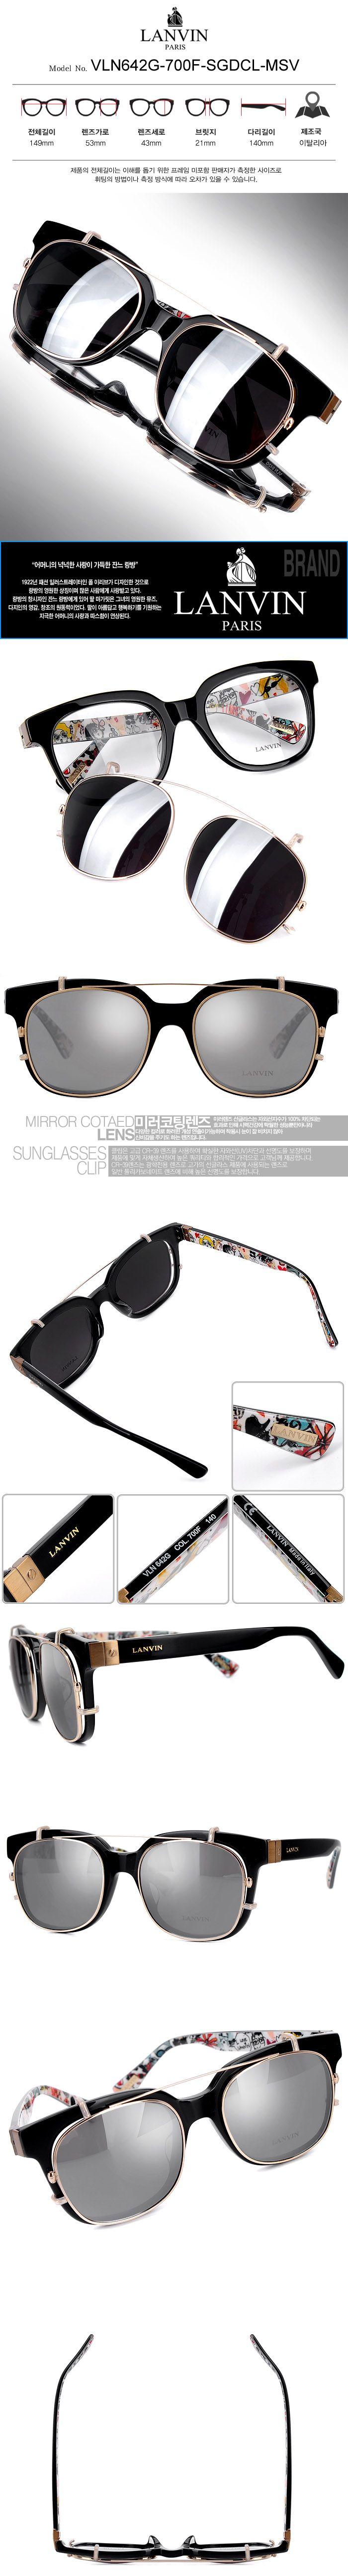 WIZWID:위즈위드 - [Lanvin:랑방][Lanvin] 랑방 명품 클립온 안경테 8종 택1